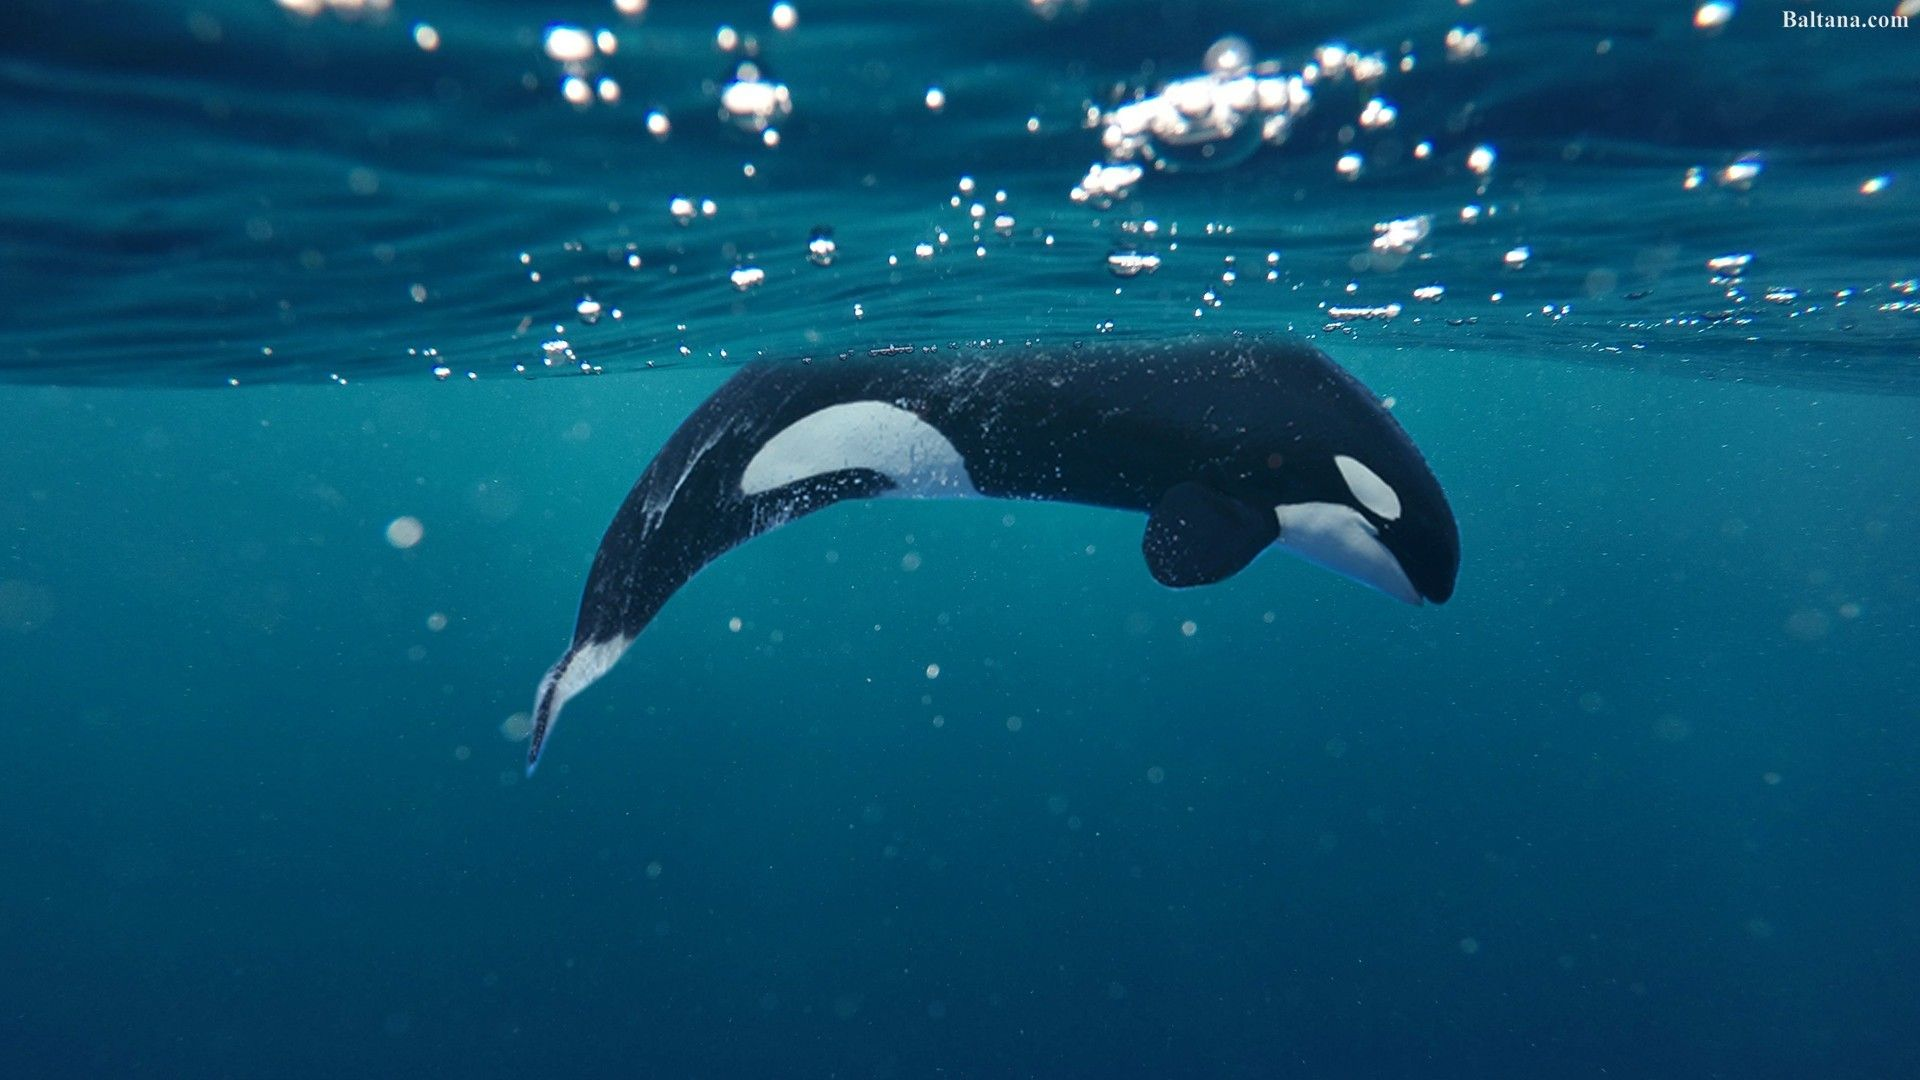 photos of a whale